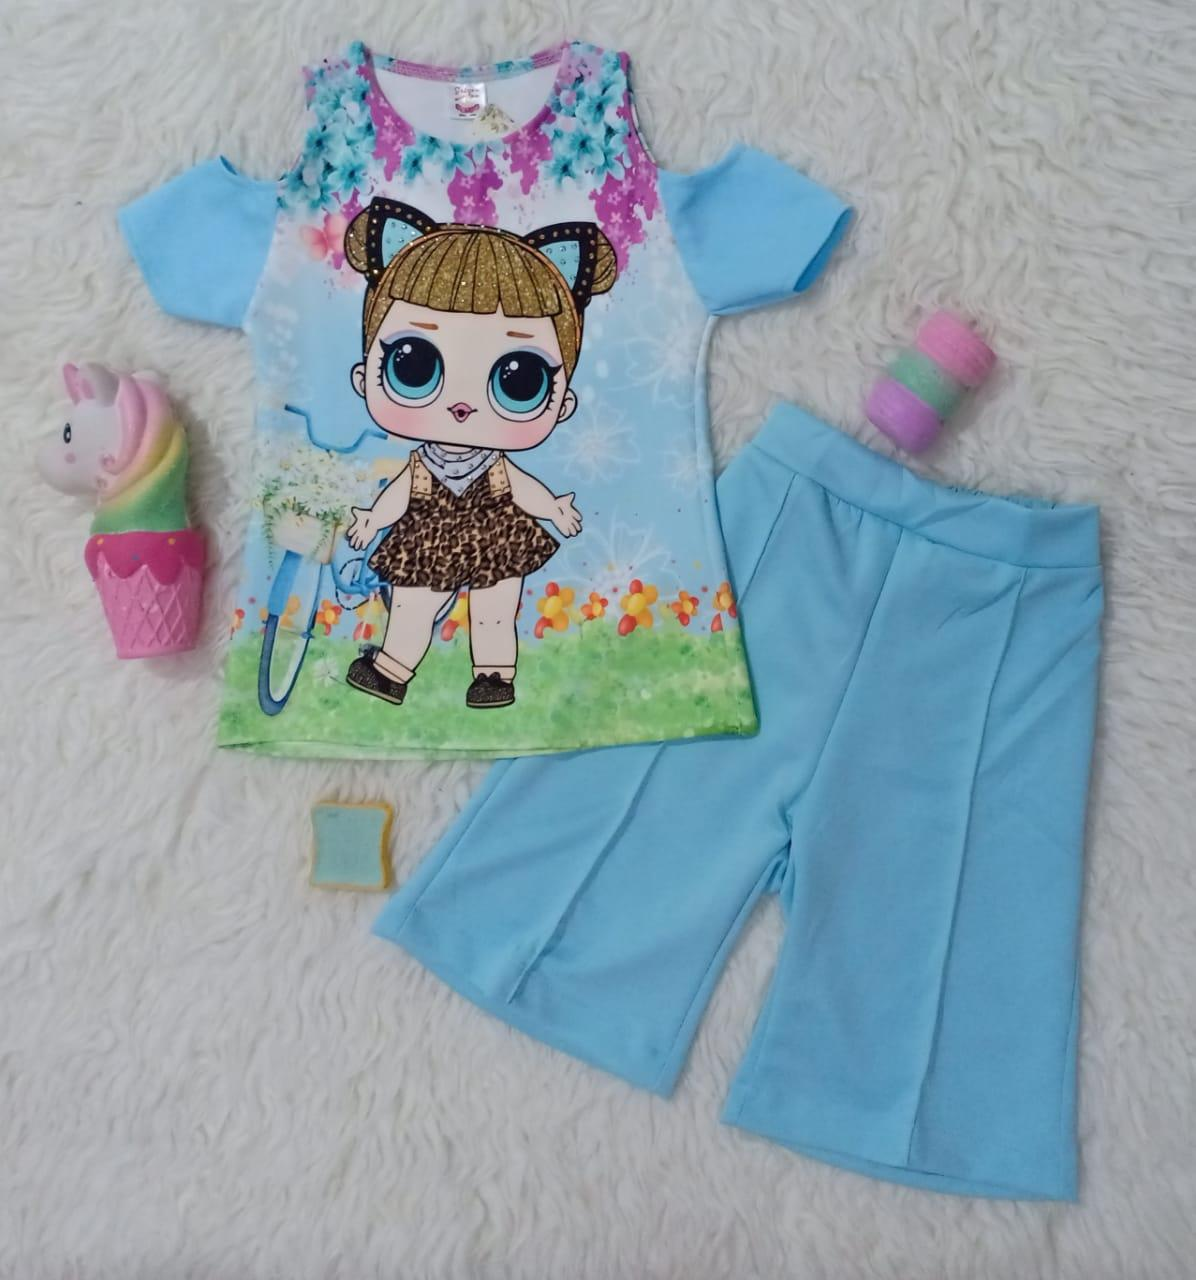 SR Collection (3 Warna Random) Pakaian Anak Perempuan Blouse Kulot BK 0028 Set 2